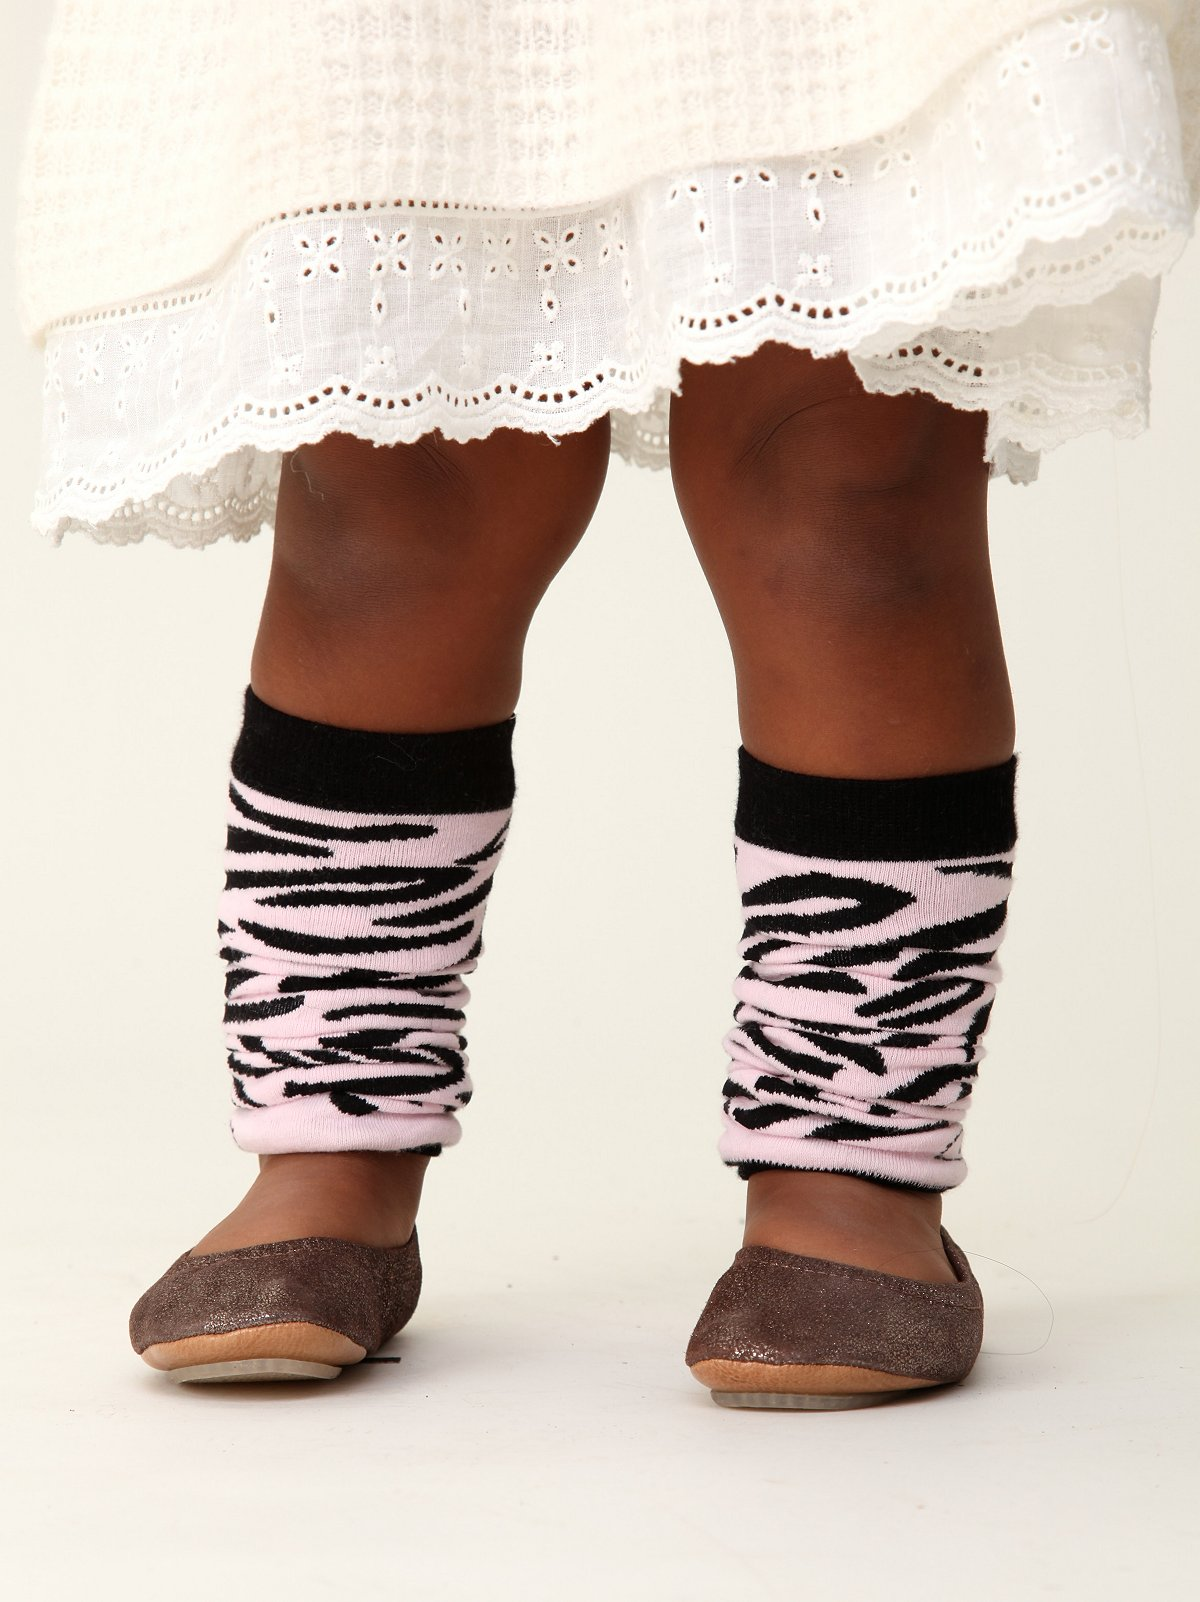 Wee People Zany Zebra Legwarmers